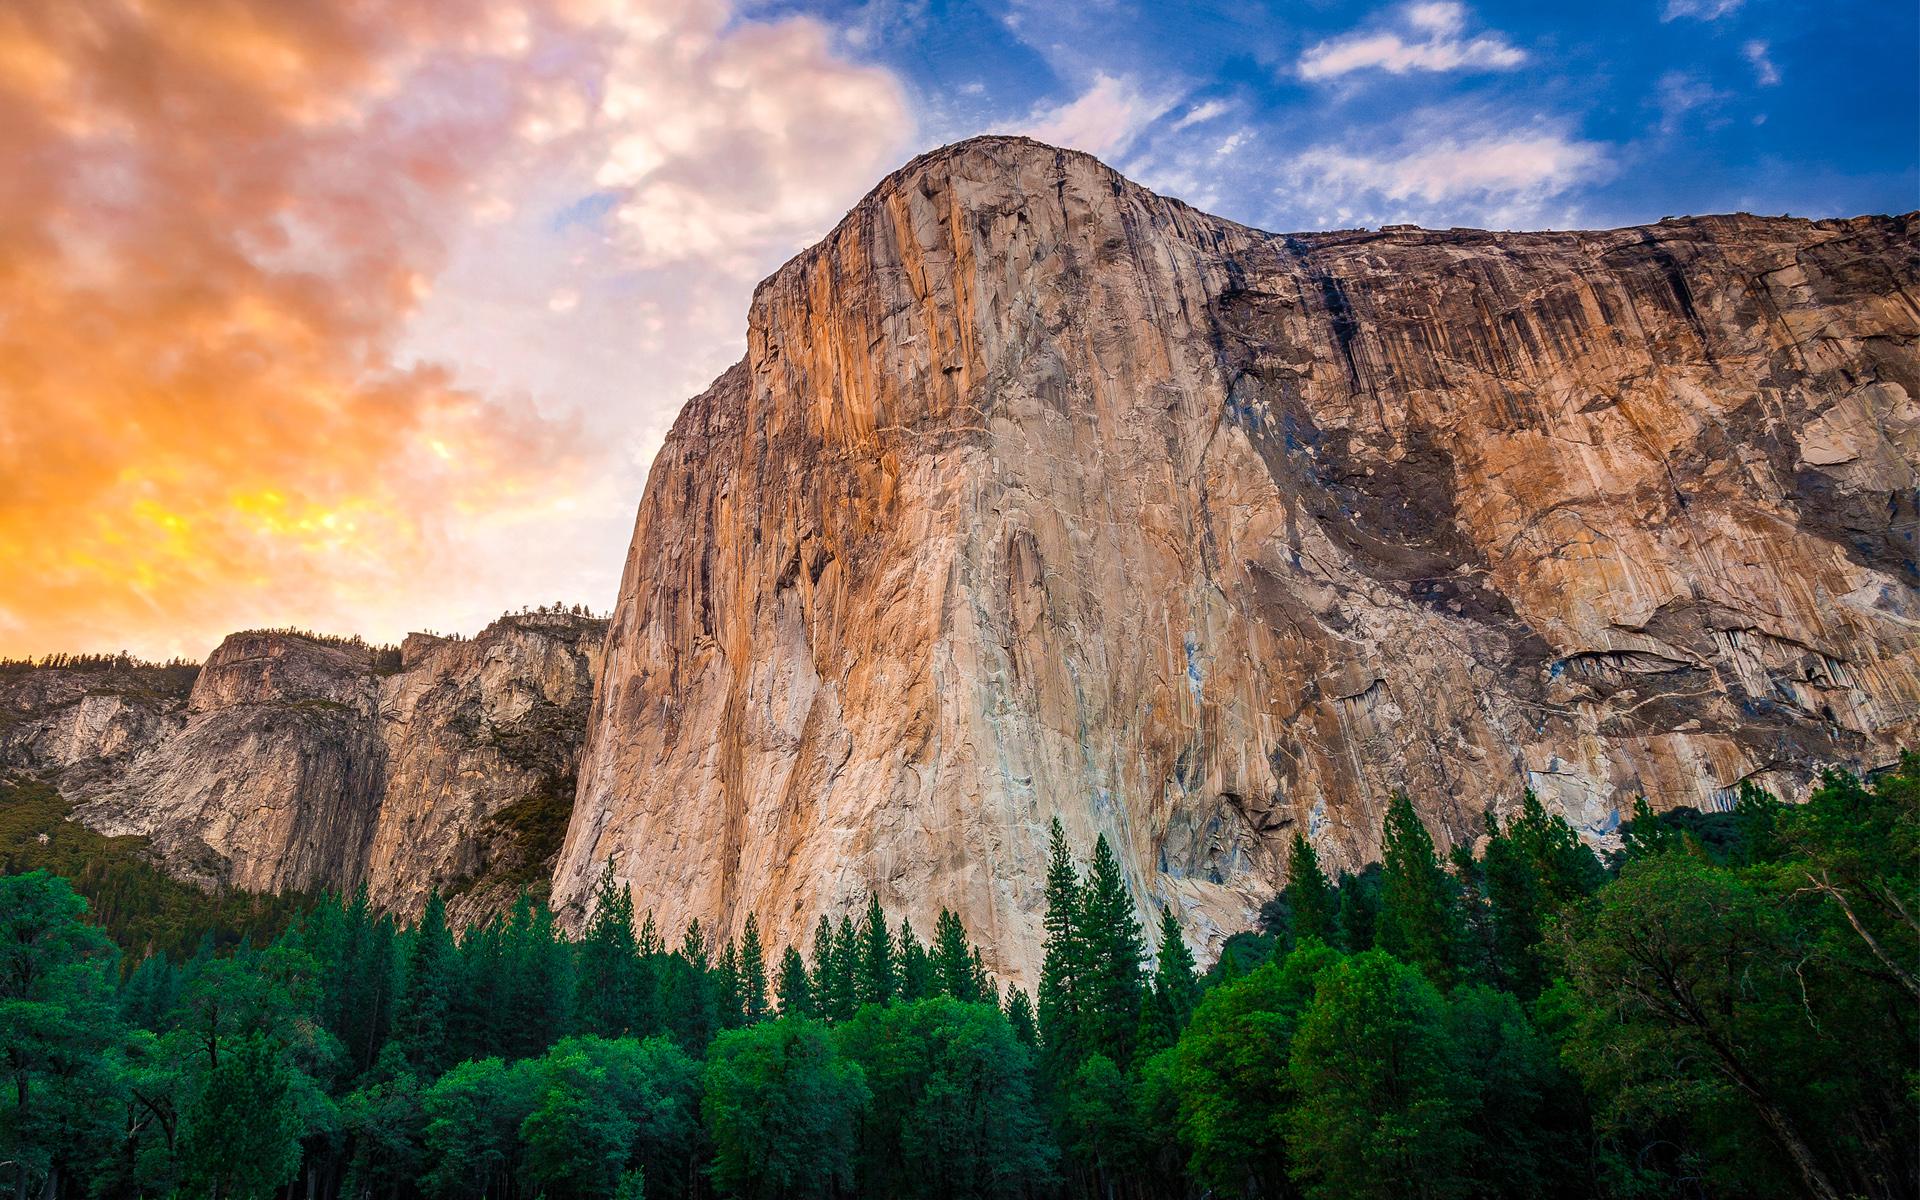 HD Wallpapers Yosemite Mountains